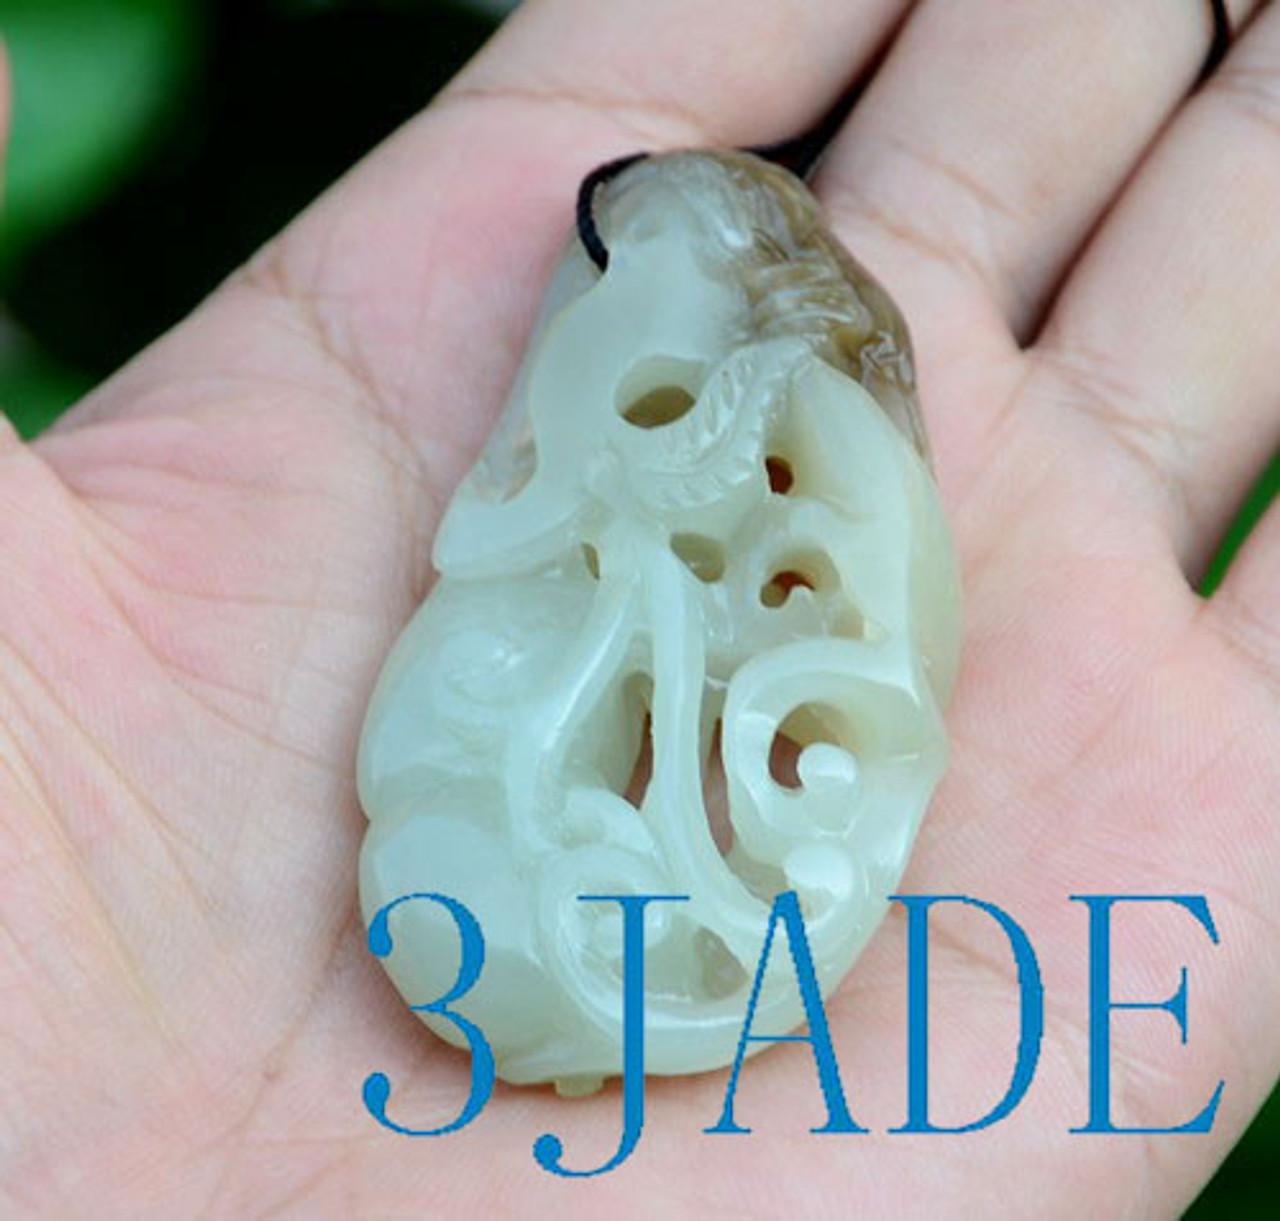 Hotan jade carving